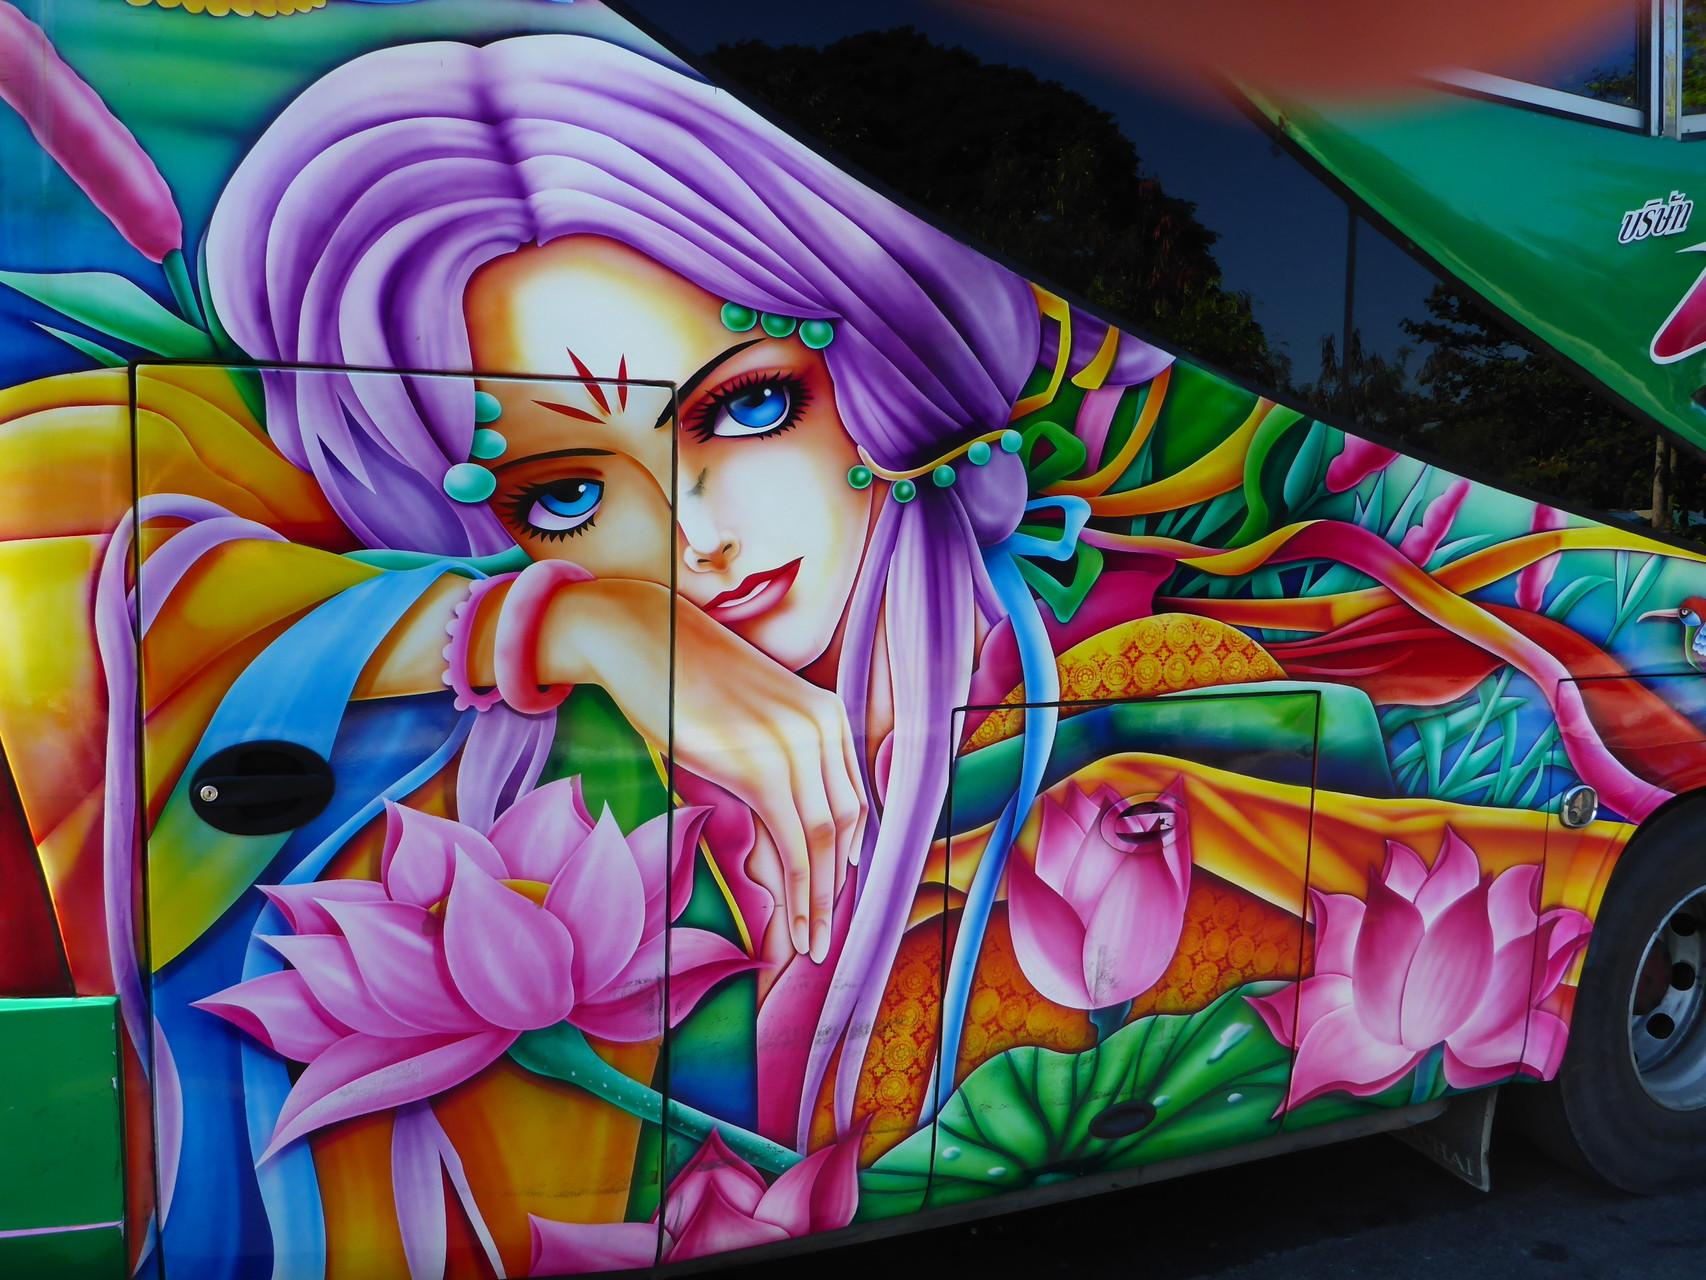 Bus mit Graffitilackierung